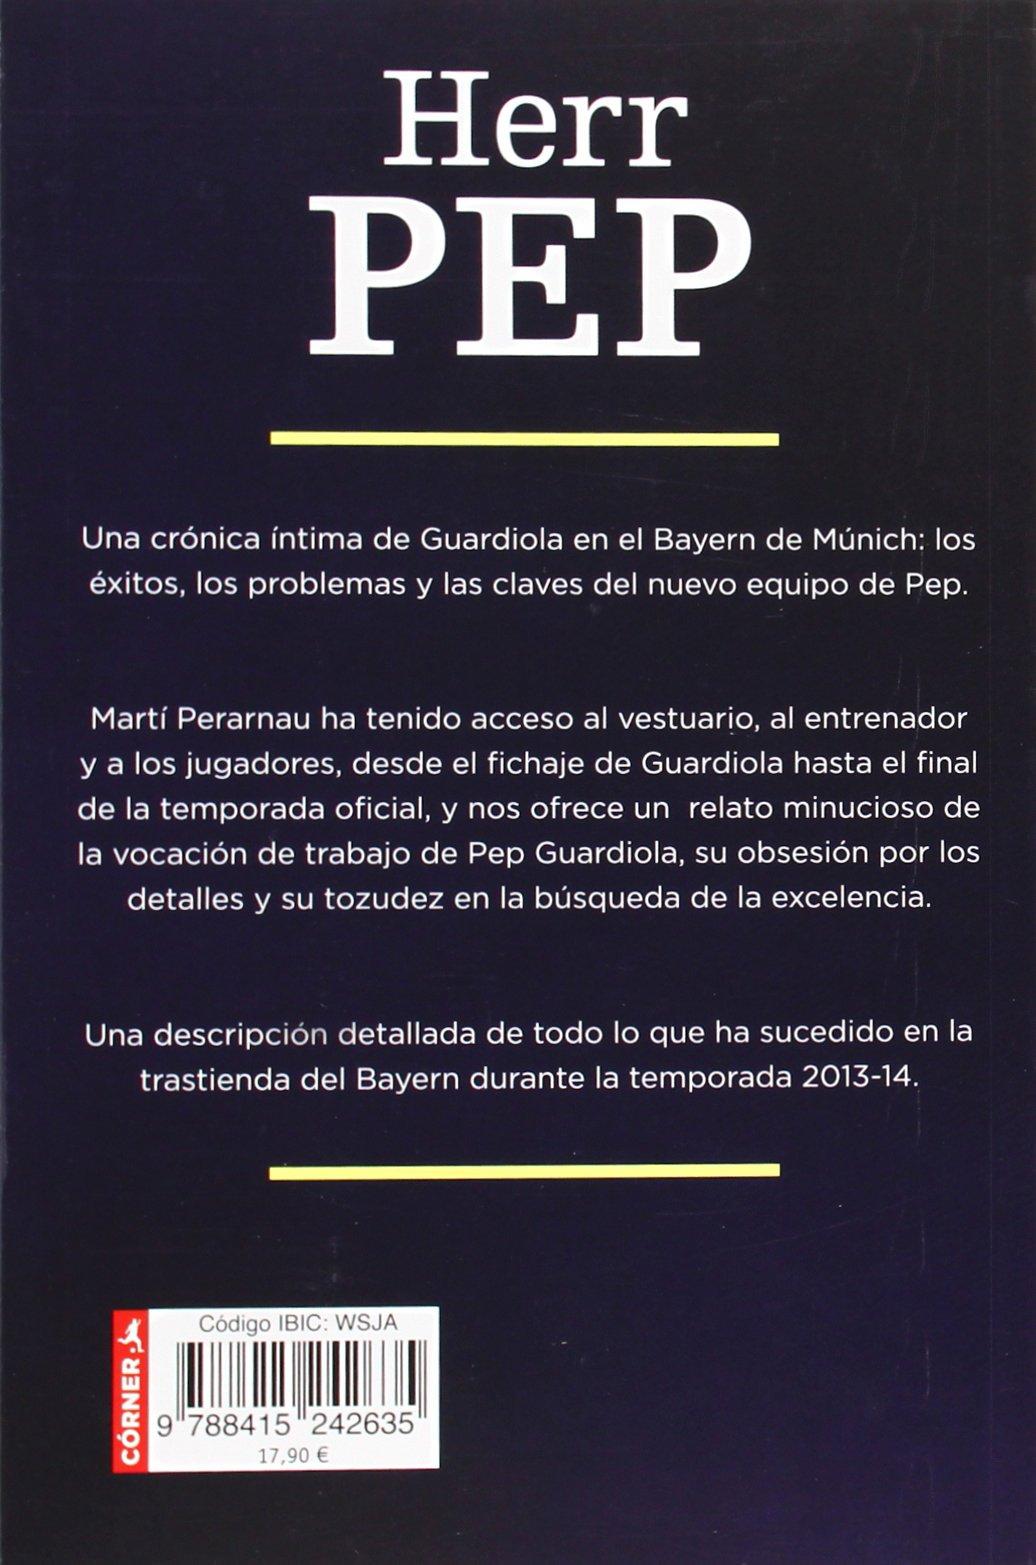 Herr pep spanish edition marti perarnau 9788415242635 amazon herr pep spanish edition marti perarnau 9788415242635 amazon books fandeluxe Gallery